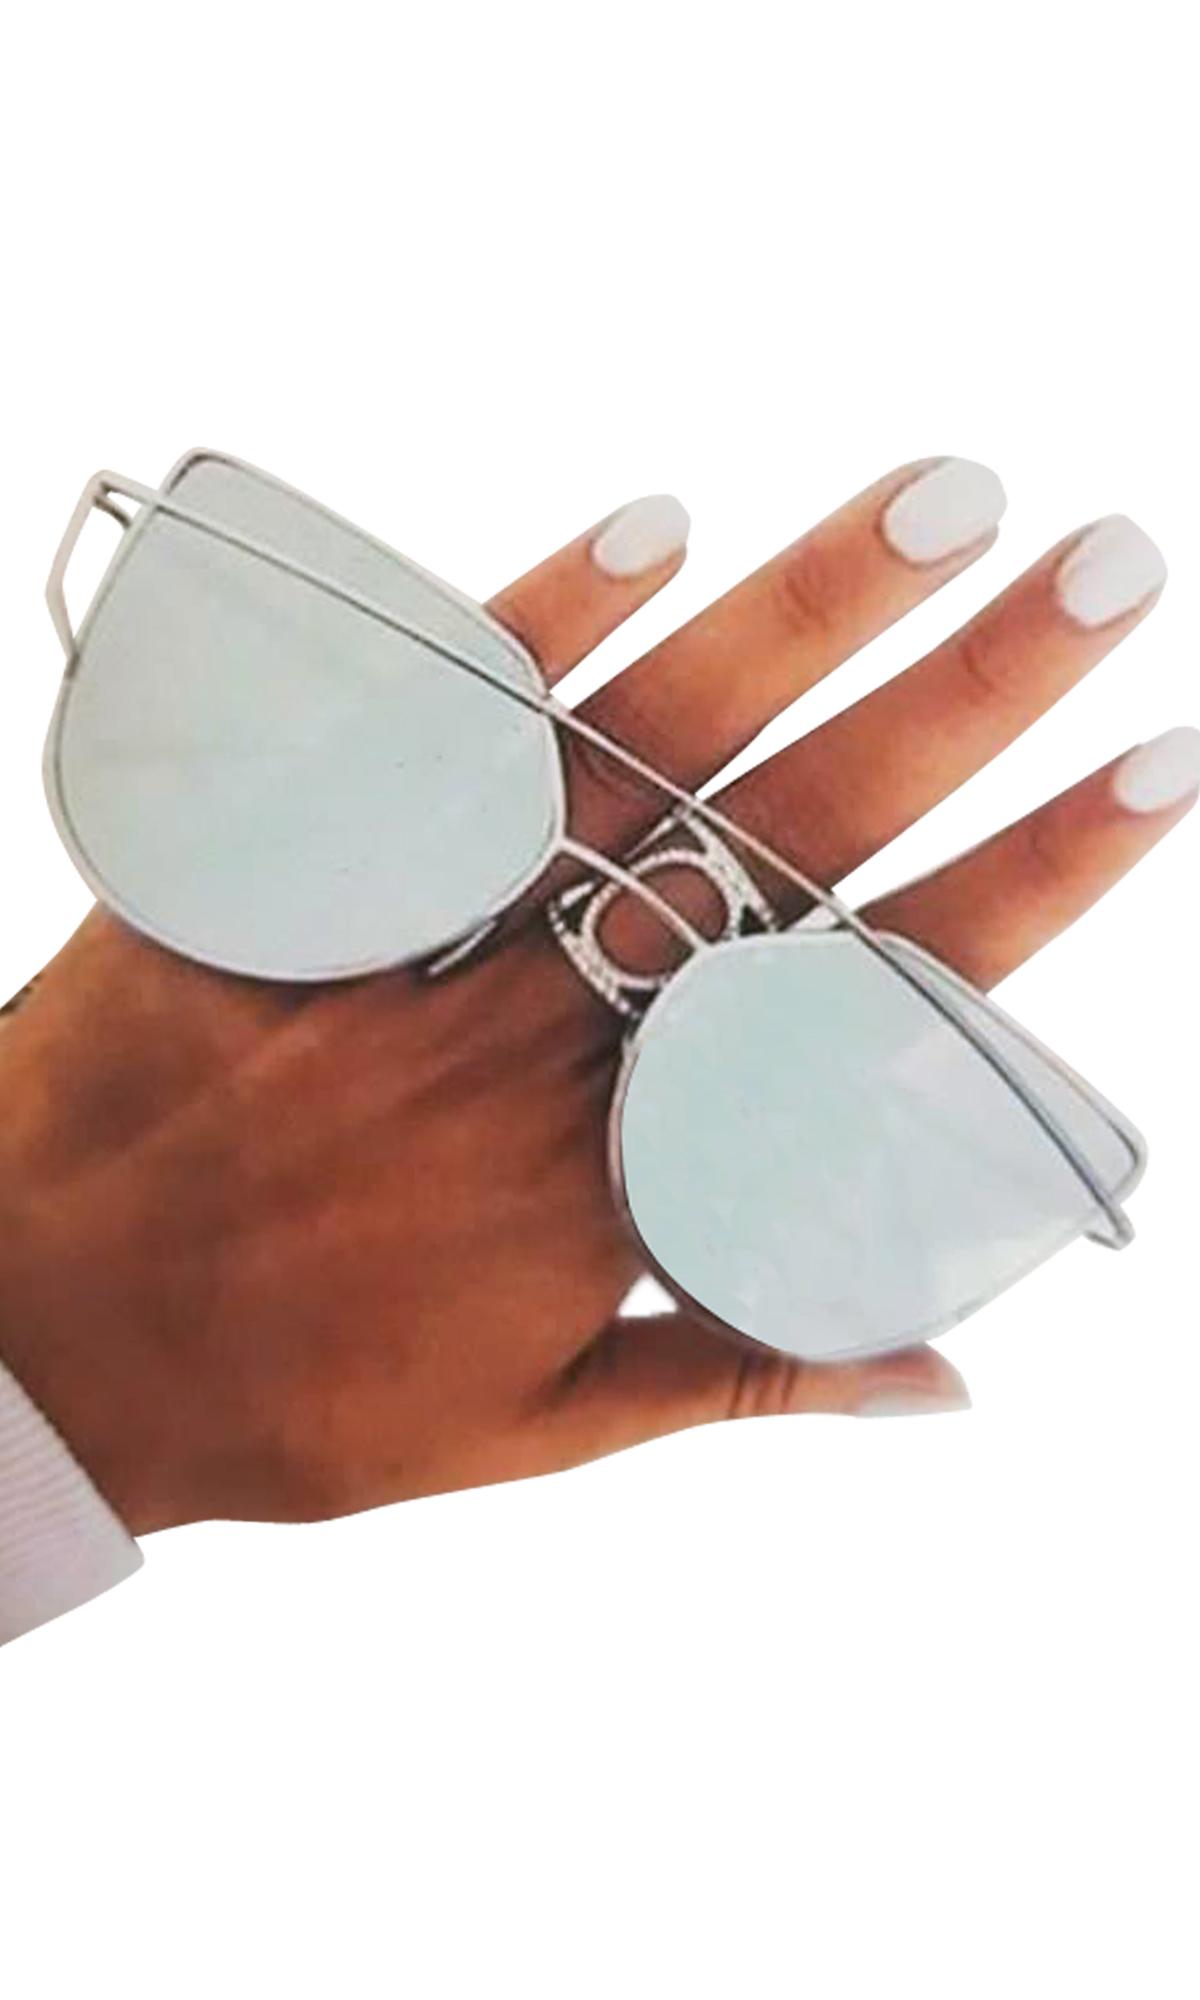 d9cd1065d6 Γυαλιά ηλίου με καθρέπτες